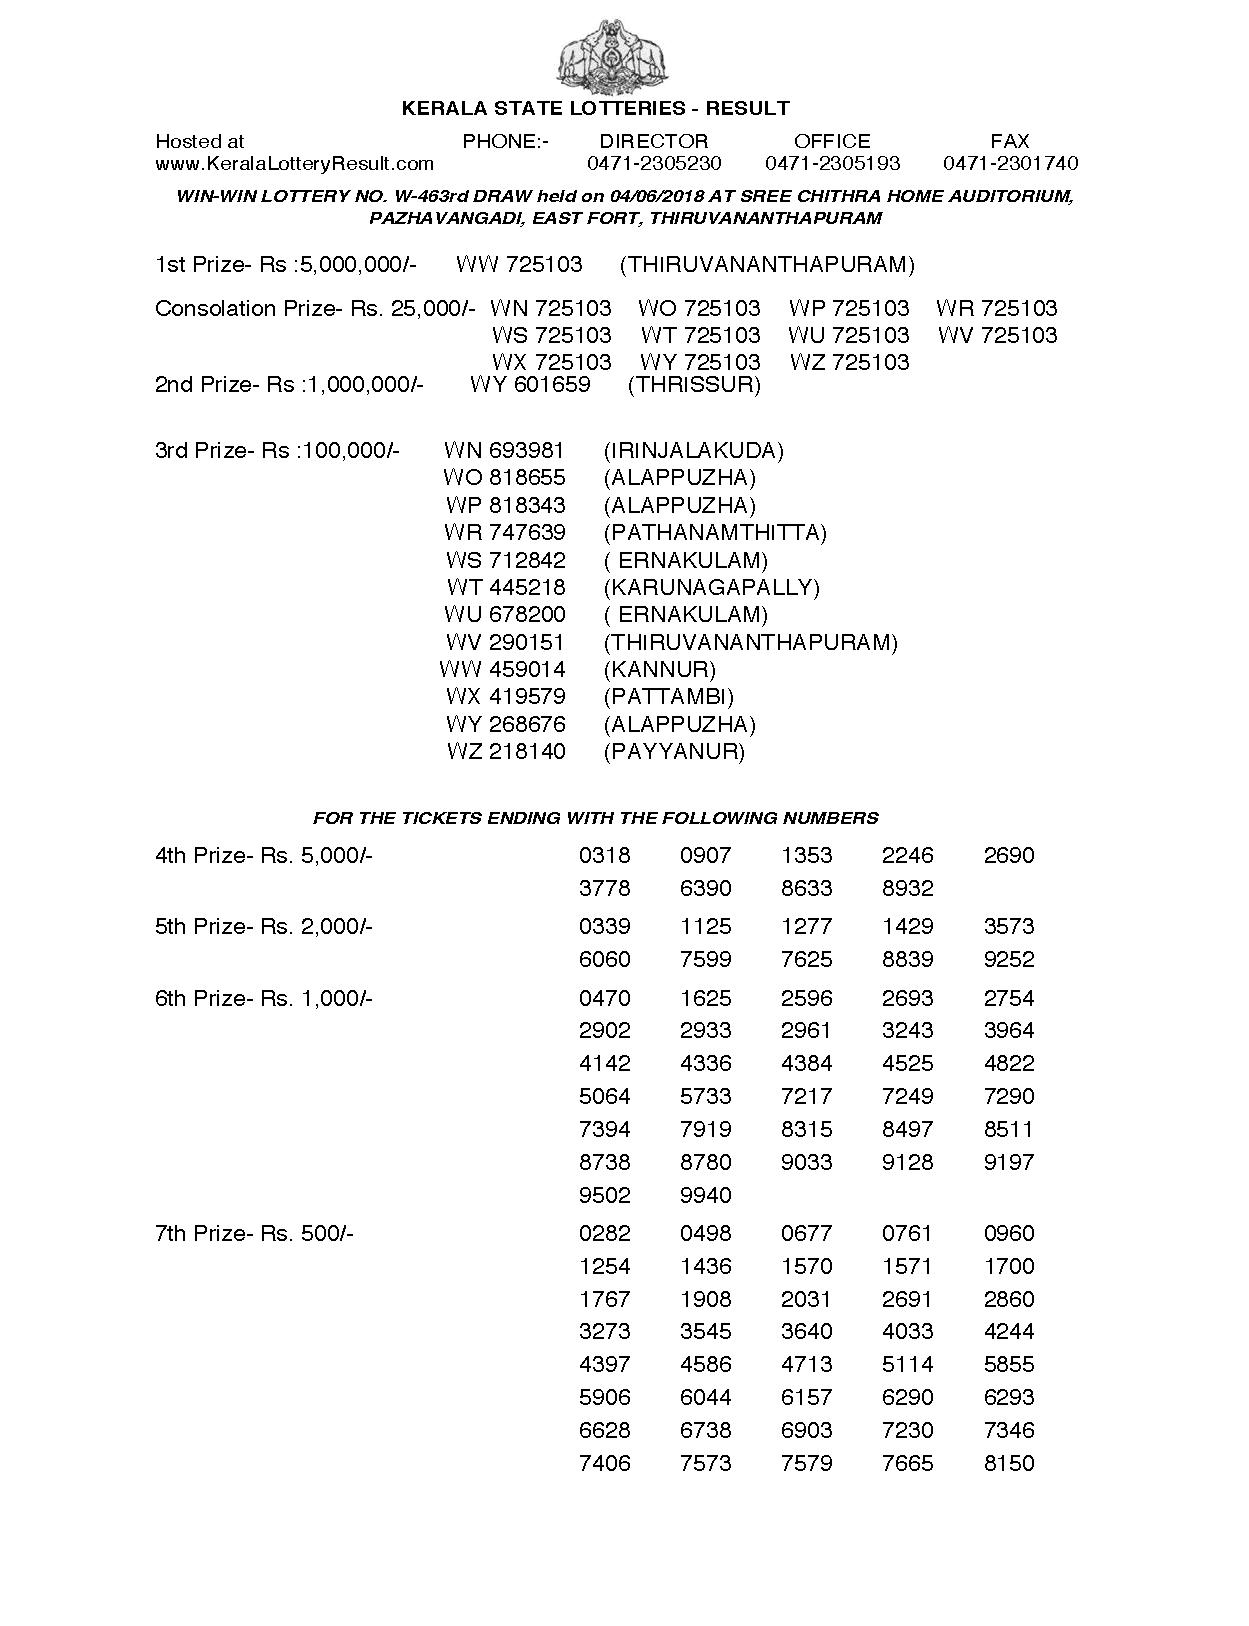 Winwin W463 Kerala Lottery Results Screenshot: Page 1